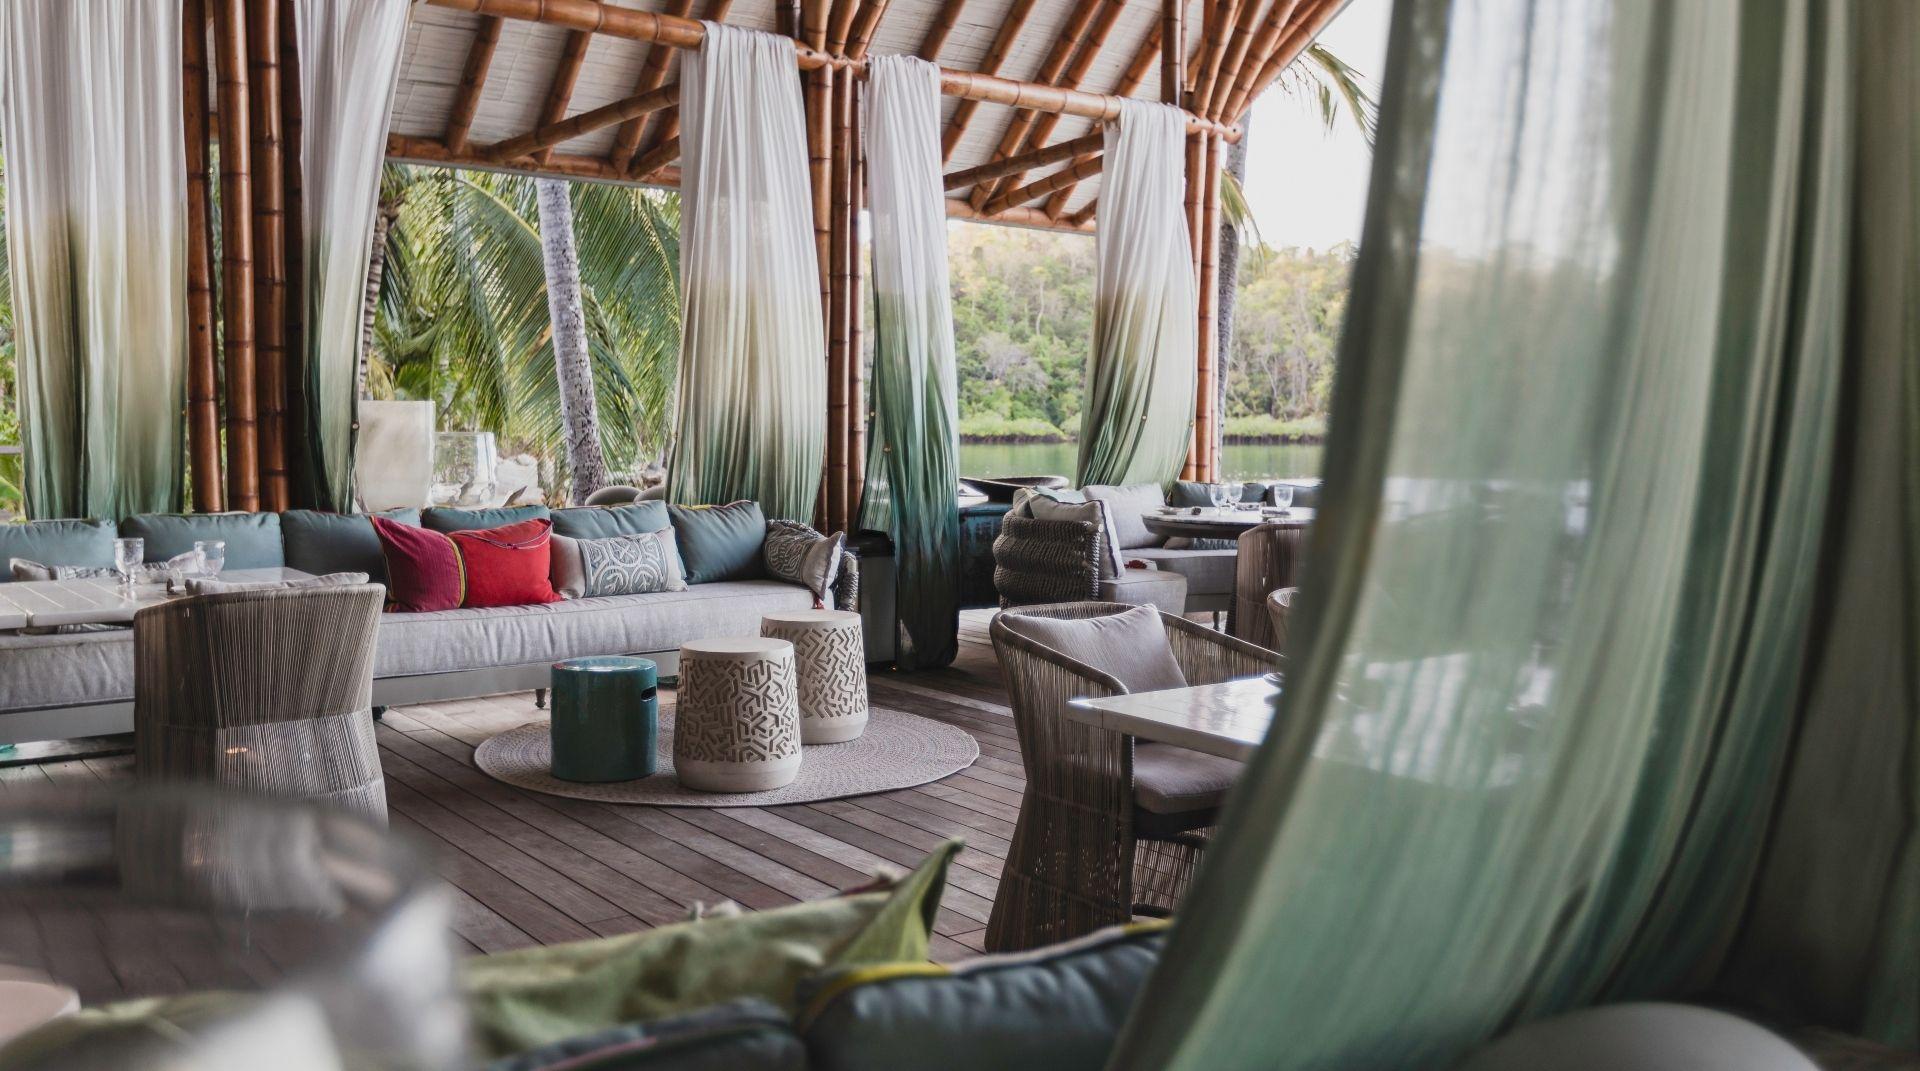 Move_Mountains_Luxury_Holidays_Sustainable_Americas_Panama_Islas_Secas_La_Terraza_lounge